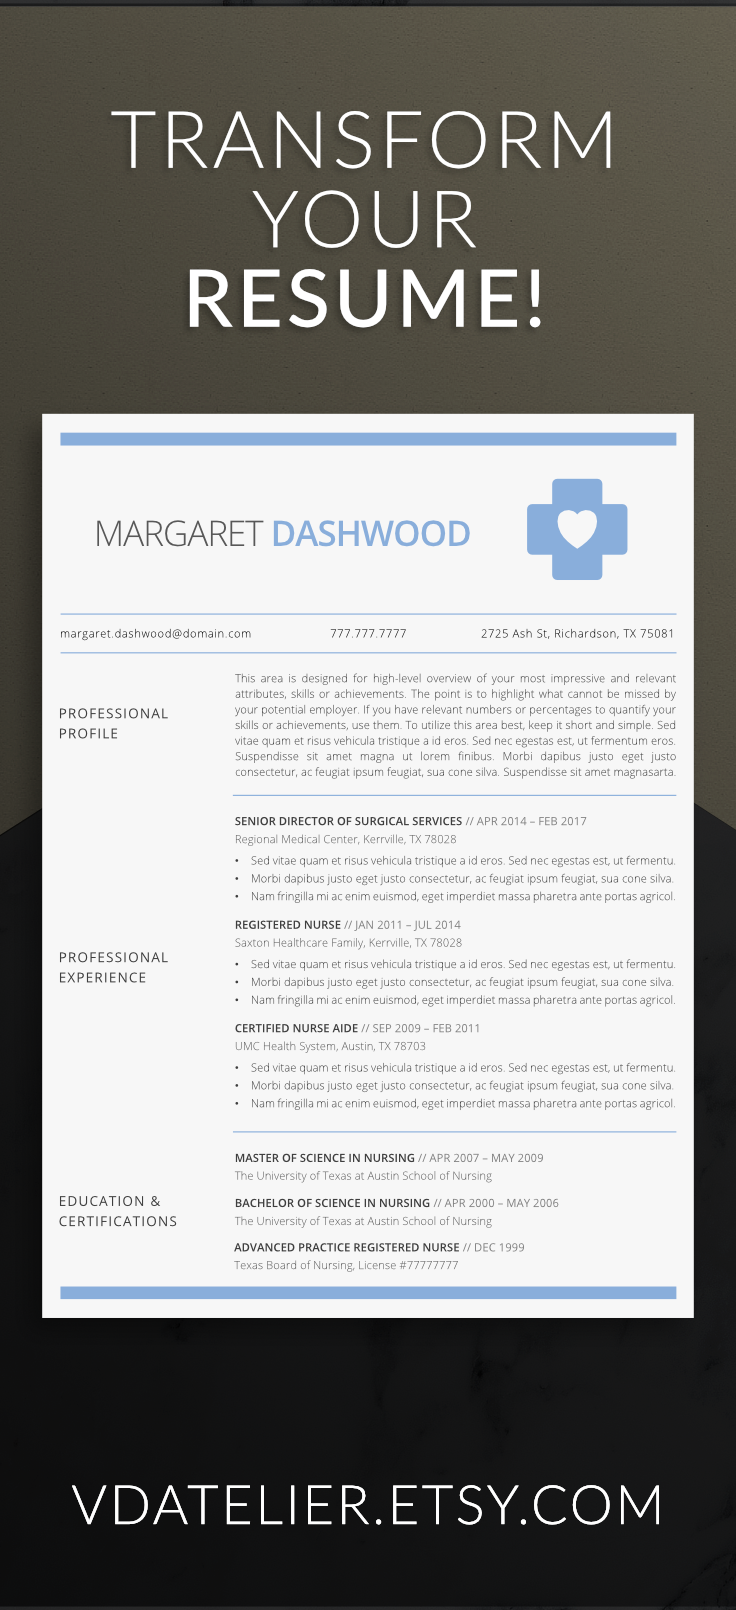 Nurse Resume Template 5 Pages Nursing Resume Template Etsy Nursing Resume Template Nursing Resume Medical Resume